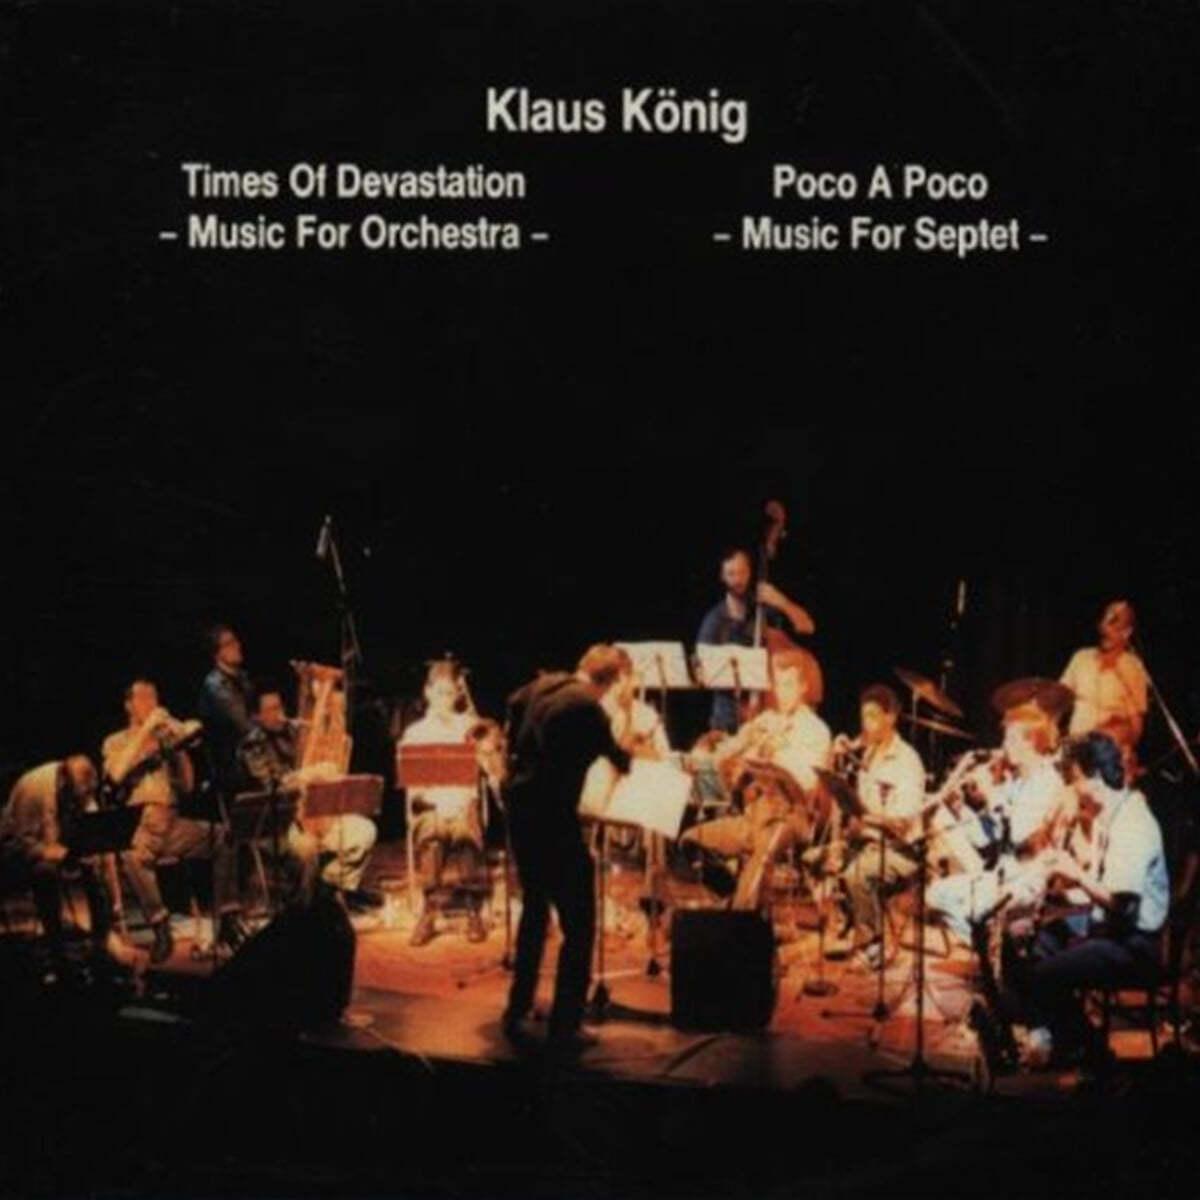 Klaus Konig (클라우스 쾨니히) - Times of Devastation / Poco A Poco